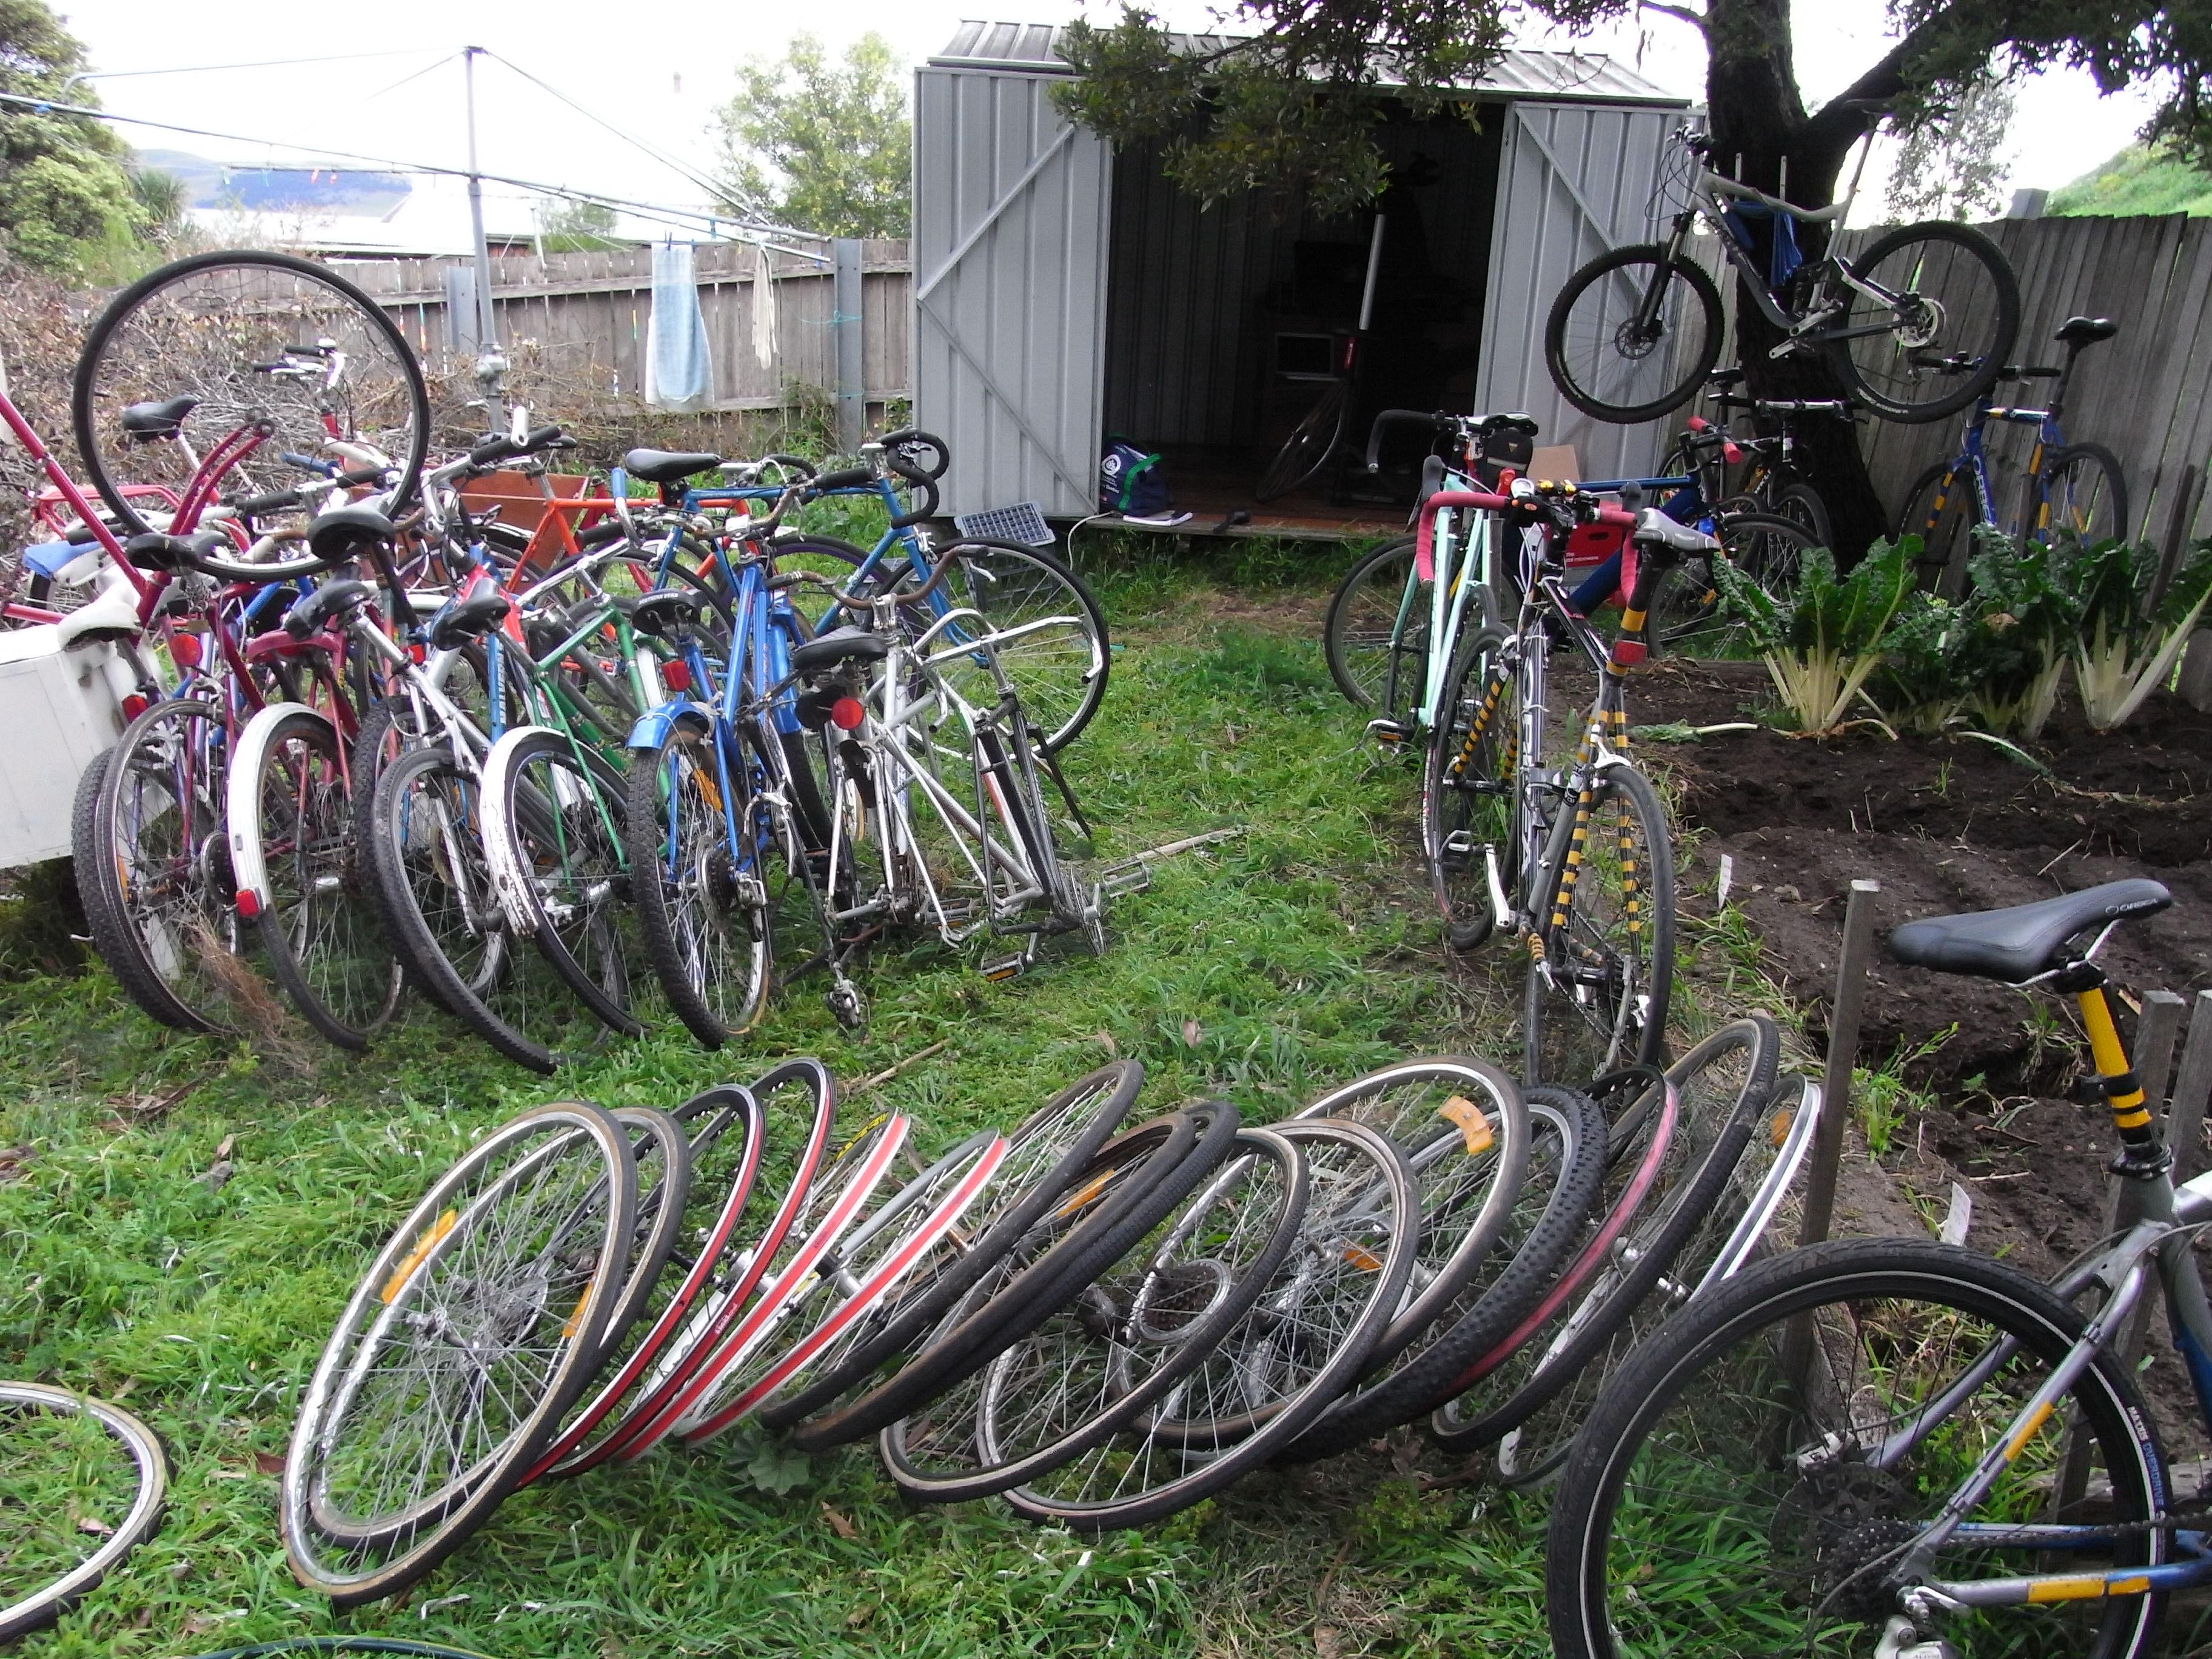 Backyard of Bicycles